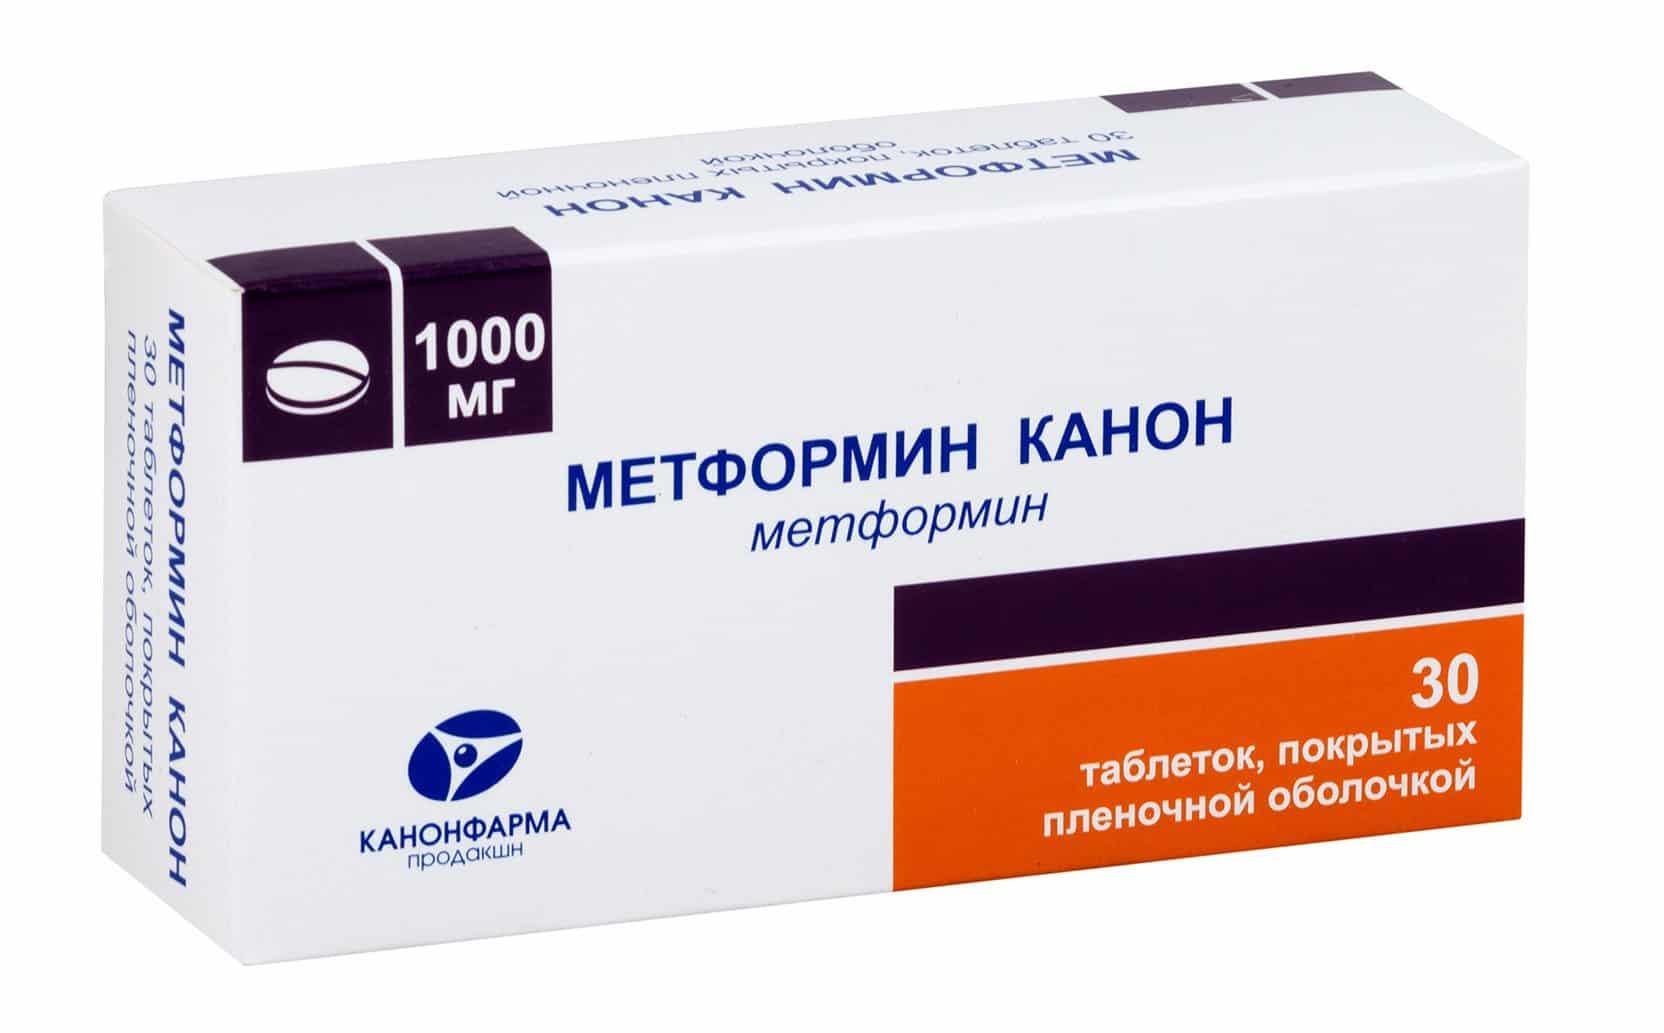 Metformin (metformin hydrochloride) coated tablets 1000 mg. №30